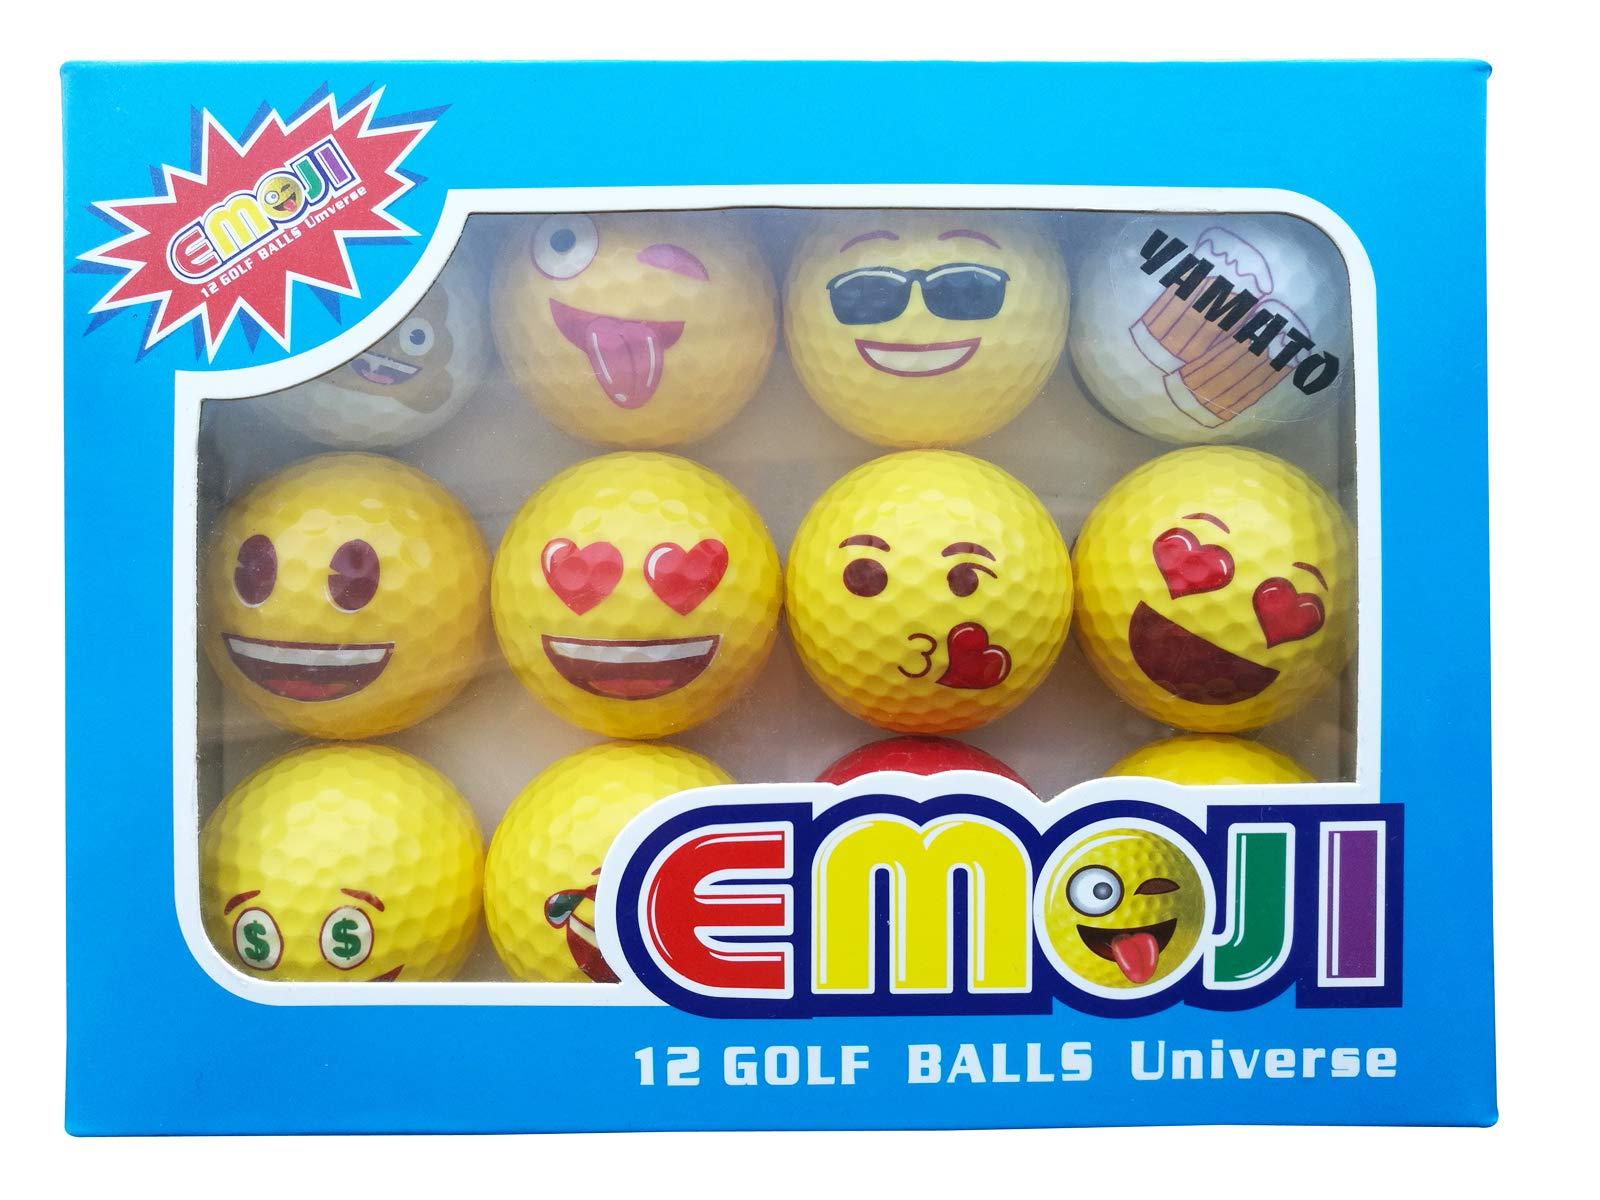 yamato Premium Emoji Golf Balls, 12 Pack Dual-Layer Novelty Professional Practice Golf Balls, Novelty Gift for All Golfers by yamato